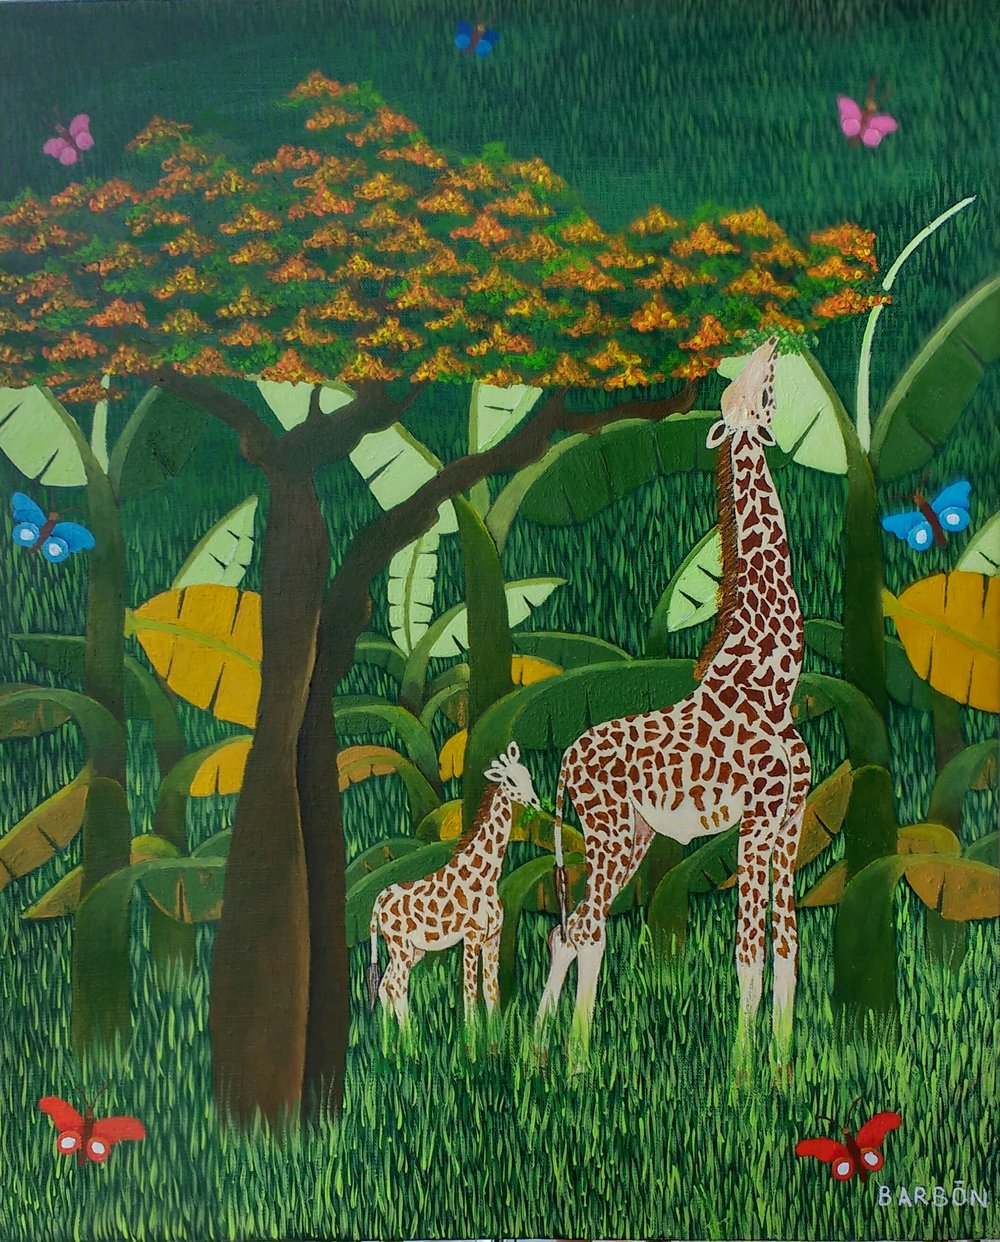 Julio Barbon Davis-La Jirafa y el Flamboyan-2017-Acrylic on Canvas-22 x 18 inches.jpg